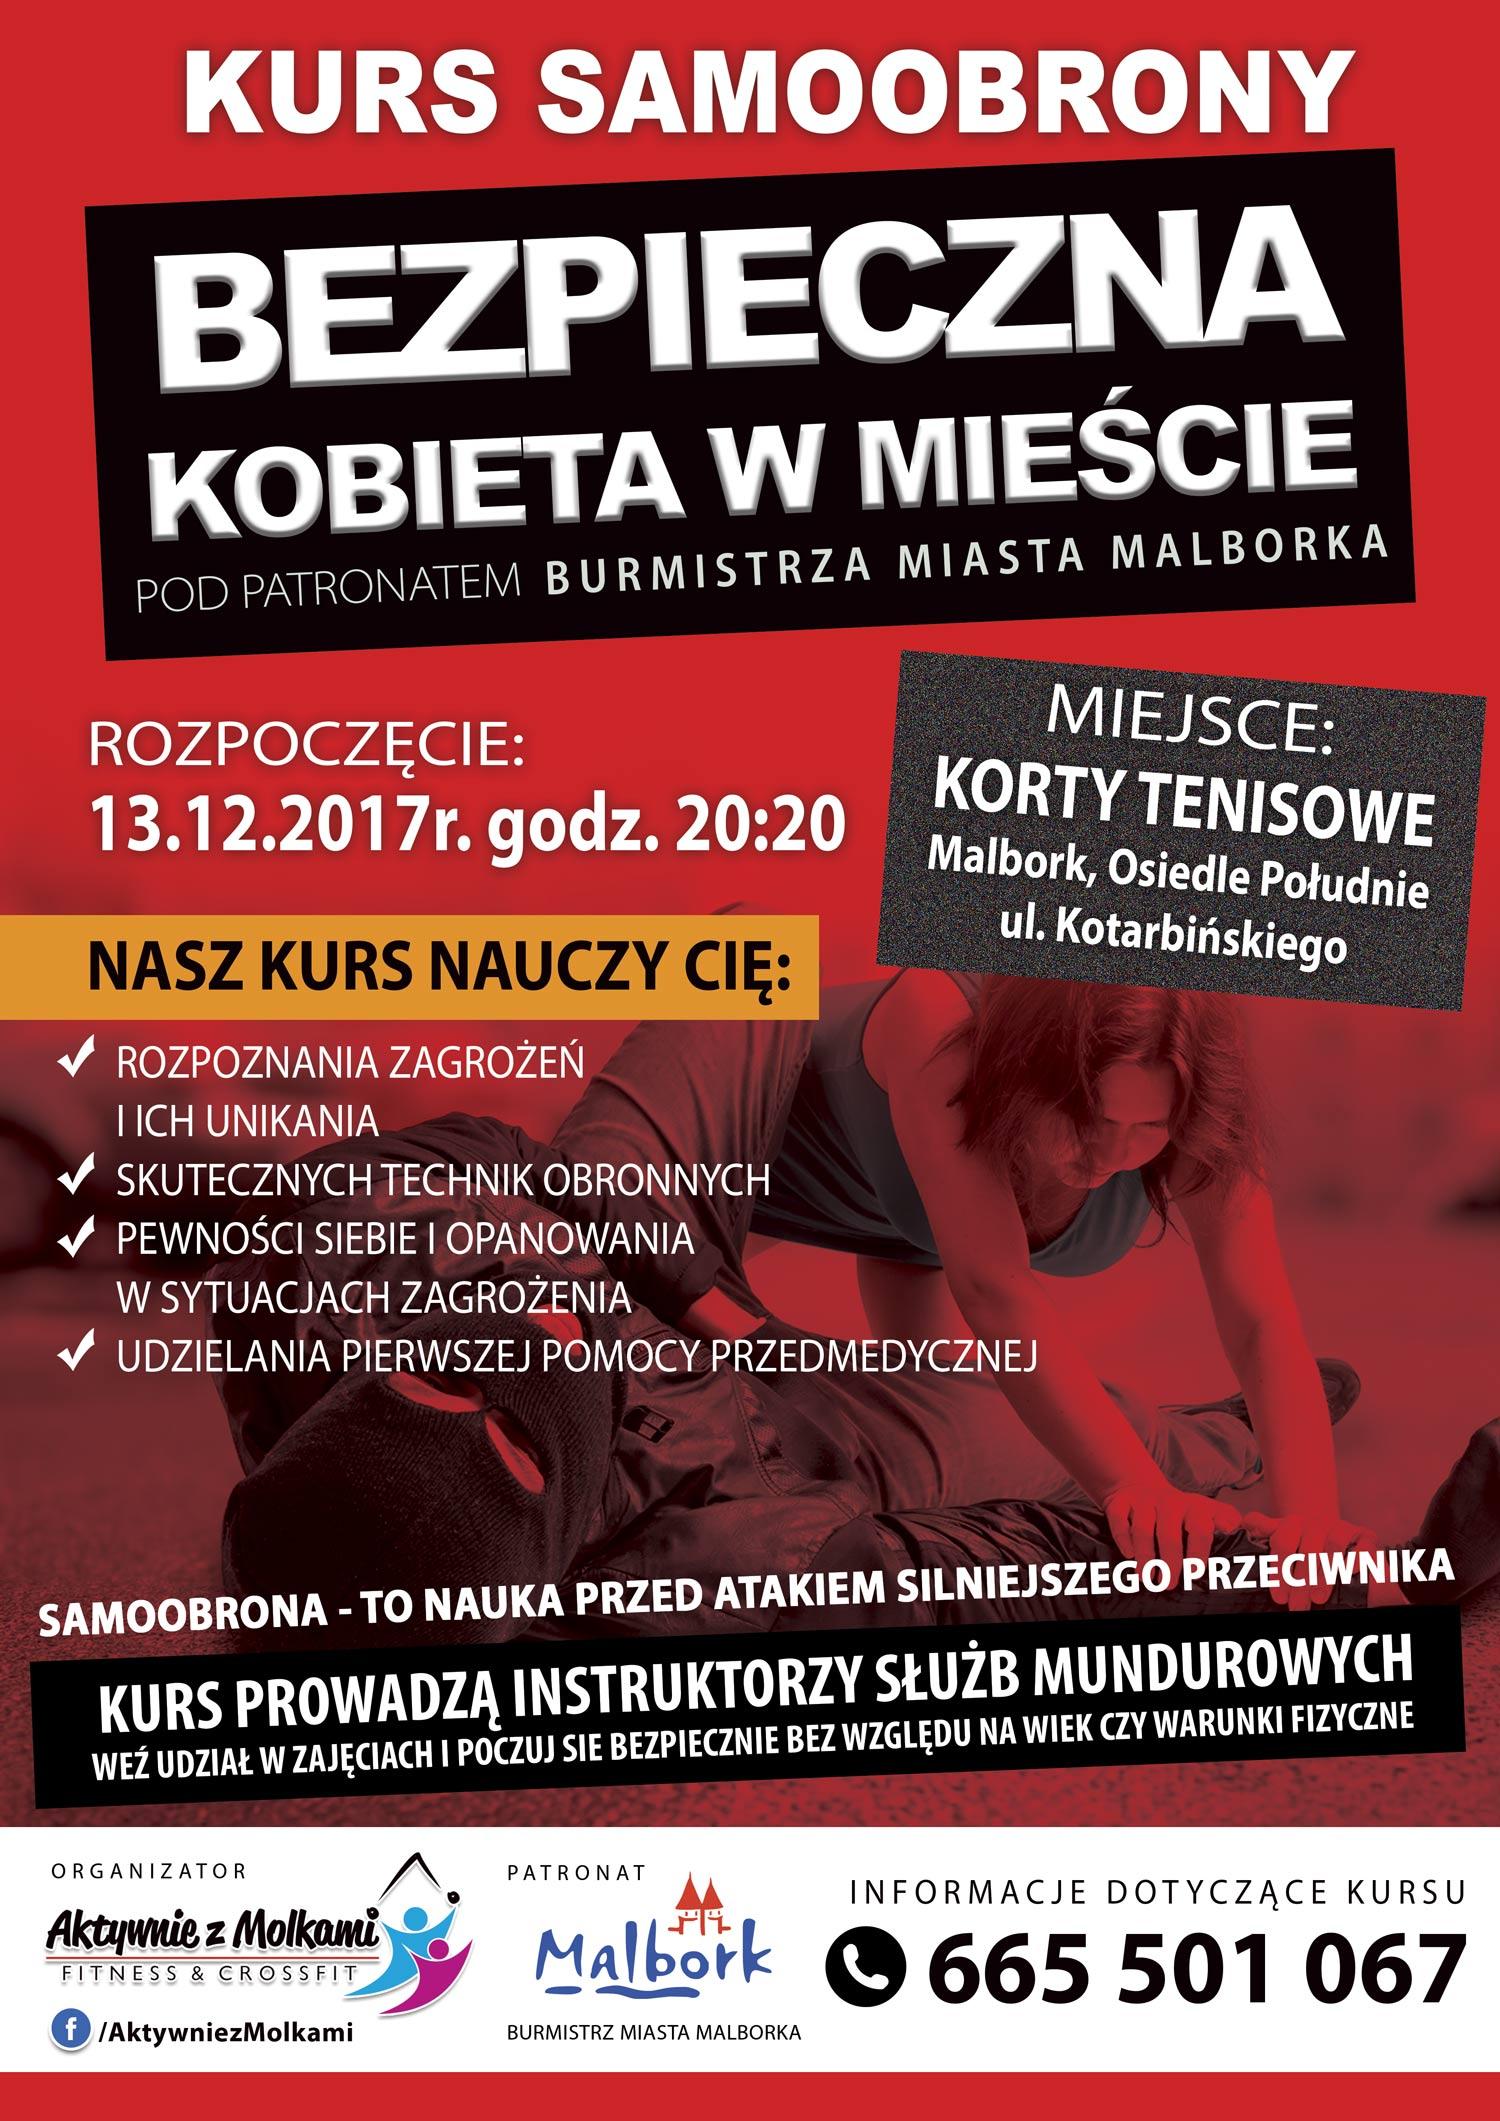 http://m.82-200.pl/2017/11/orig/samoobrona-13-12-2017-2060.jpg